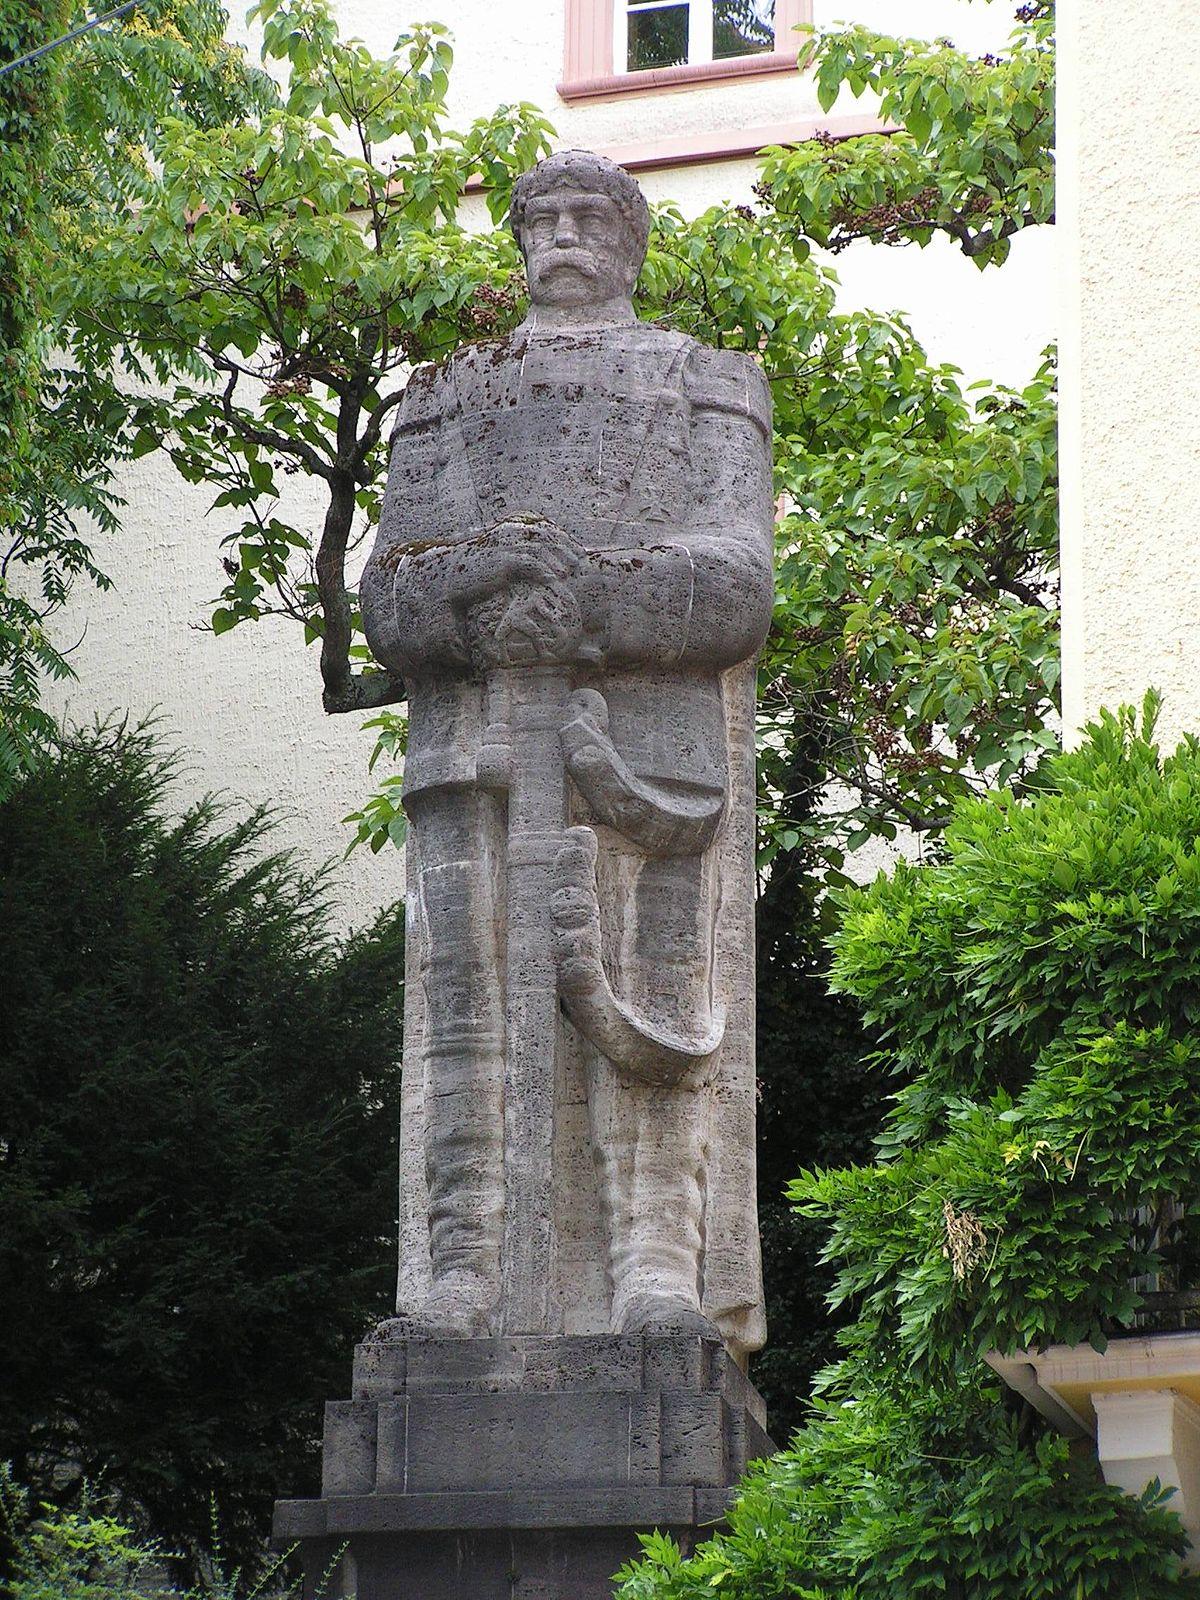 Statues of Otto von Bismarck - Wikimedia Commons